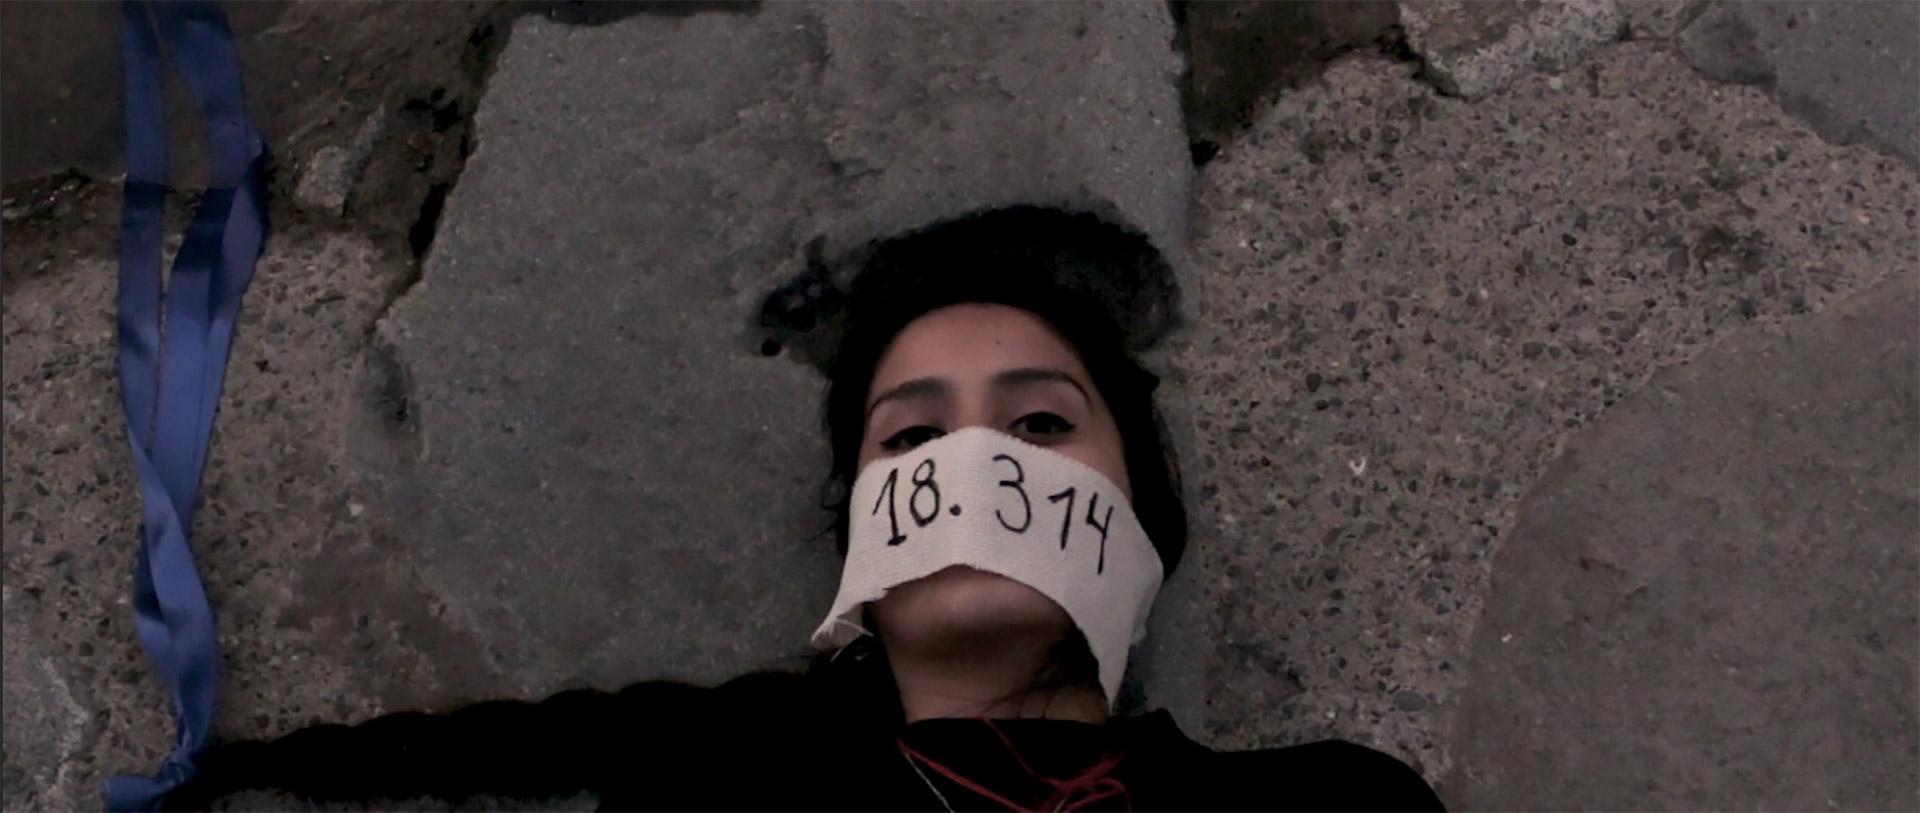 Mapuche Intervention - Work 18.314: Mari pura warangka küla pataka mari meli